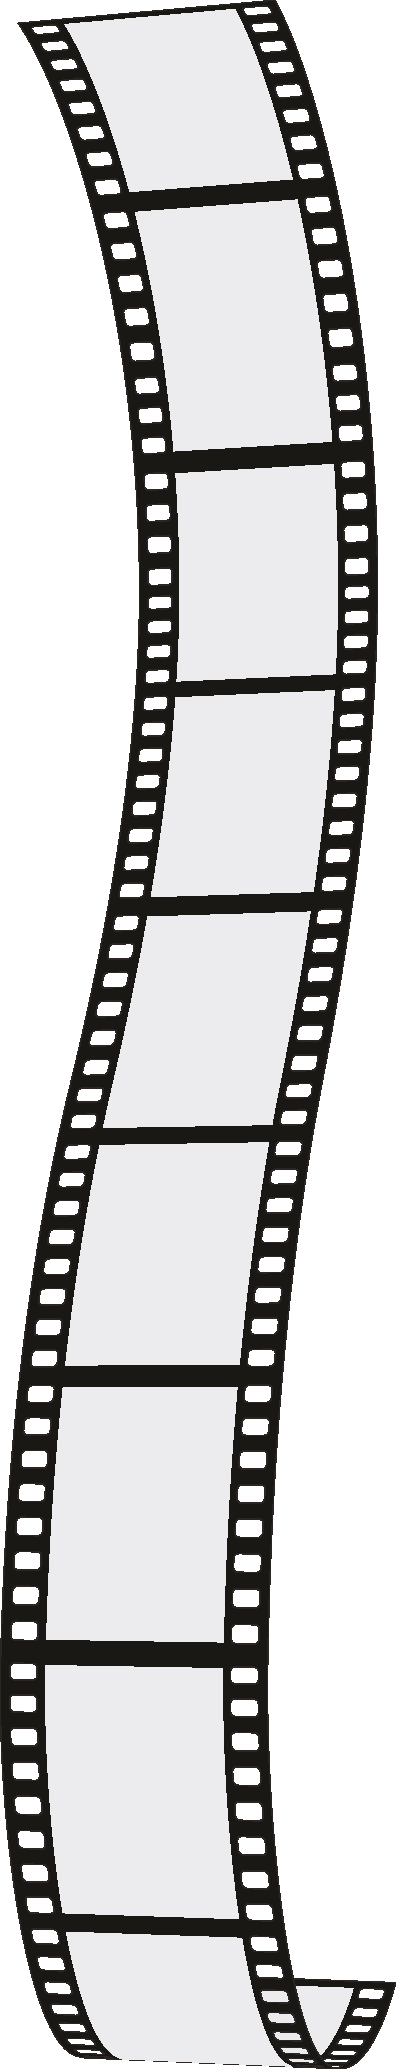 Film Strip 4 Roll Set Vector Png Image Film Image Png Roll Set Strip Vector Film Strip Film Camera Art